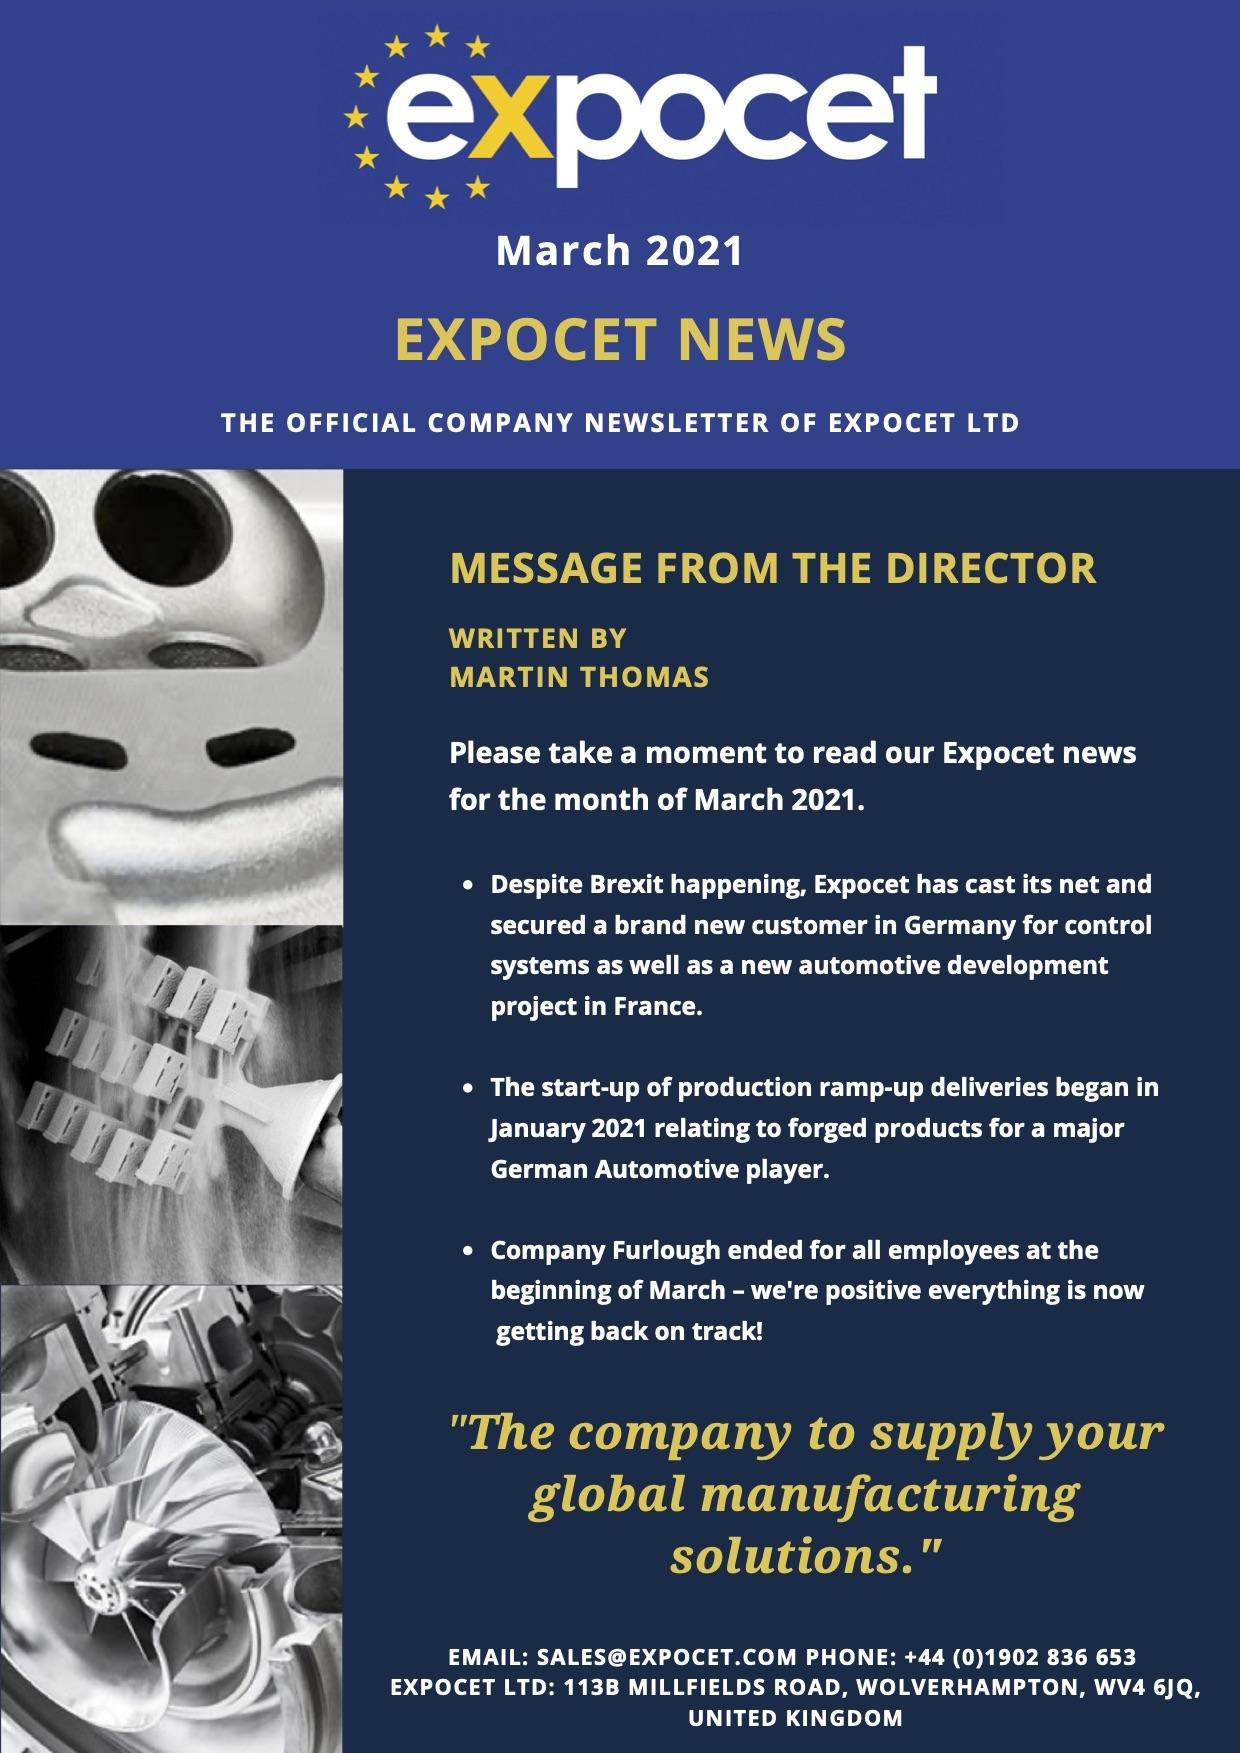 Expocet Newsletter March 2021